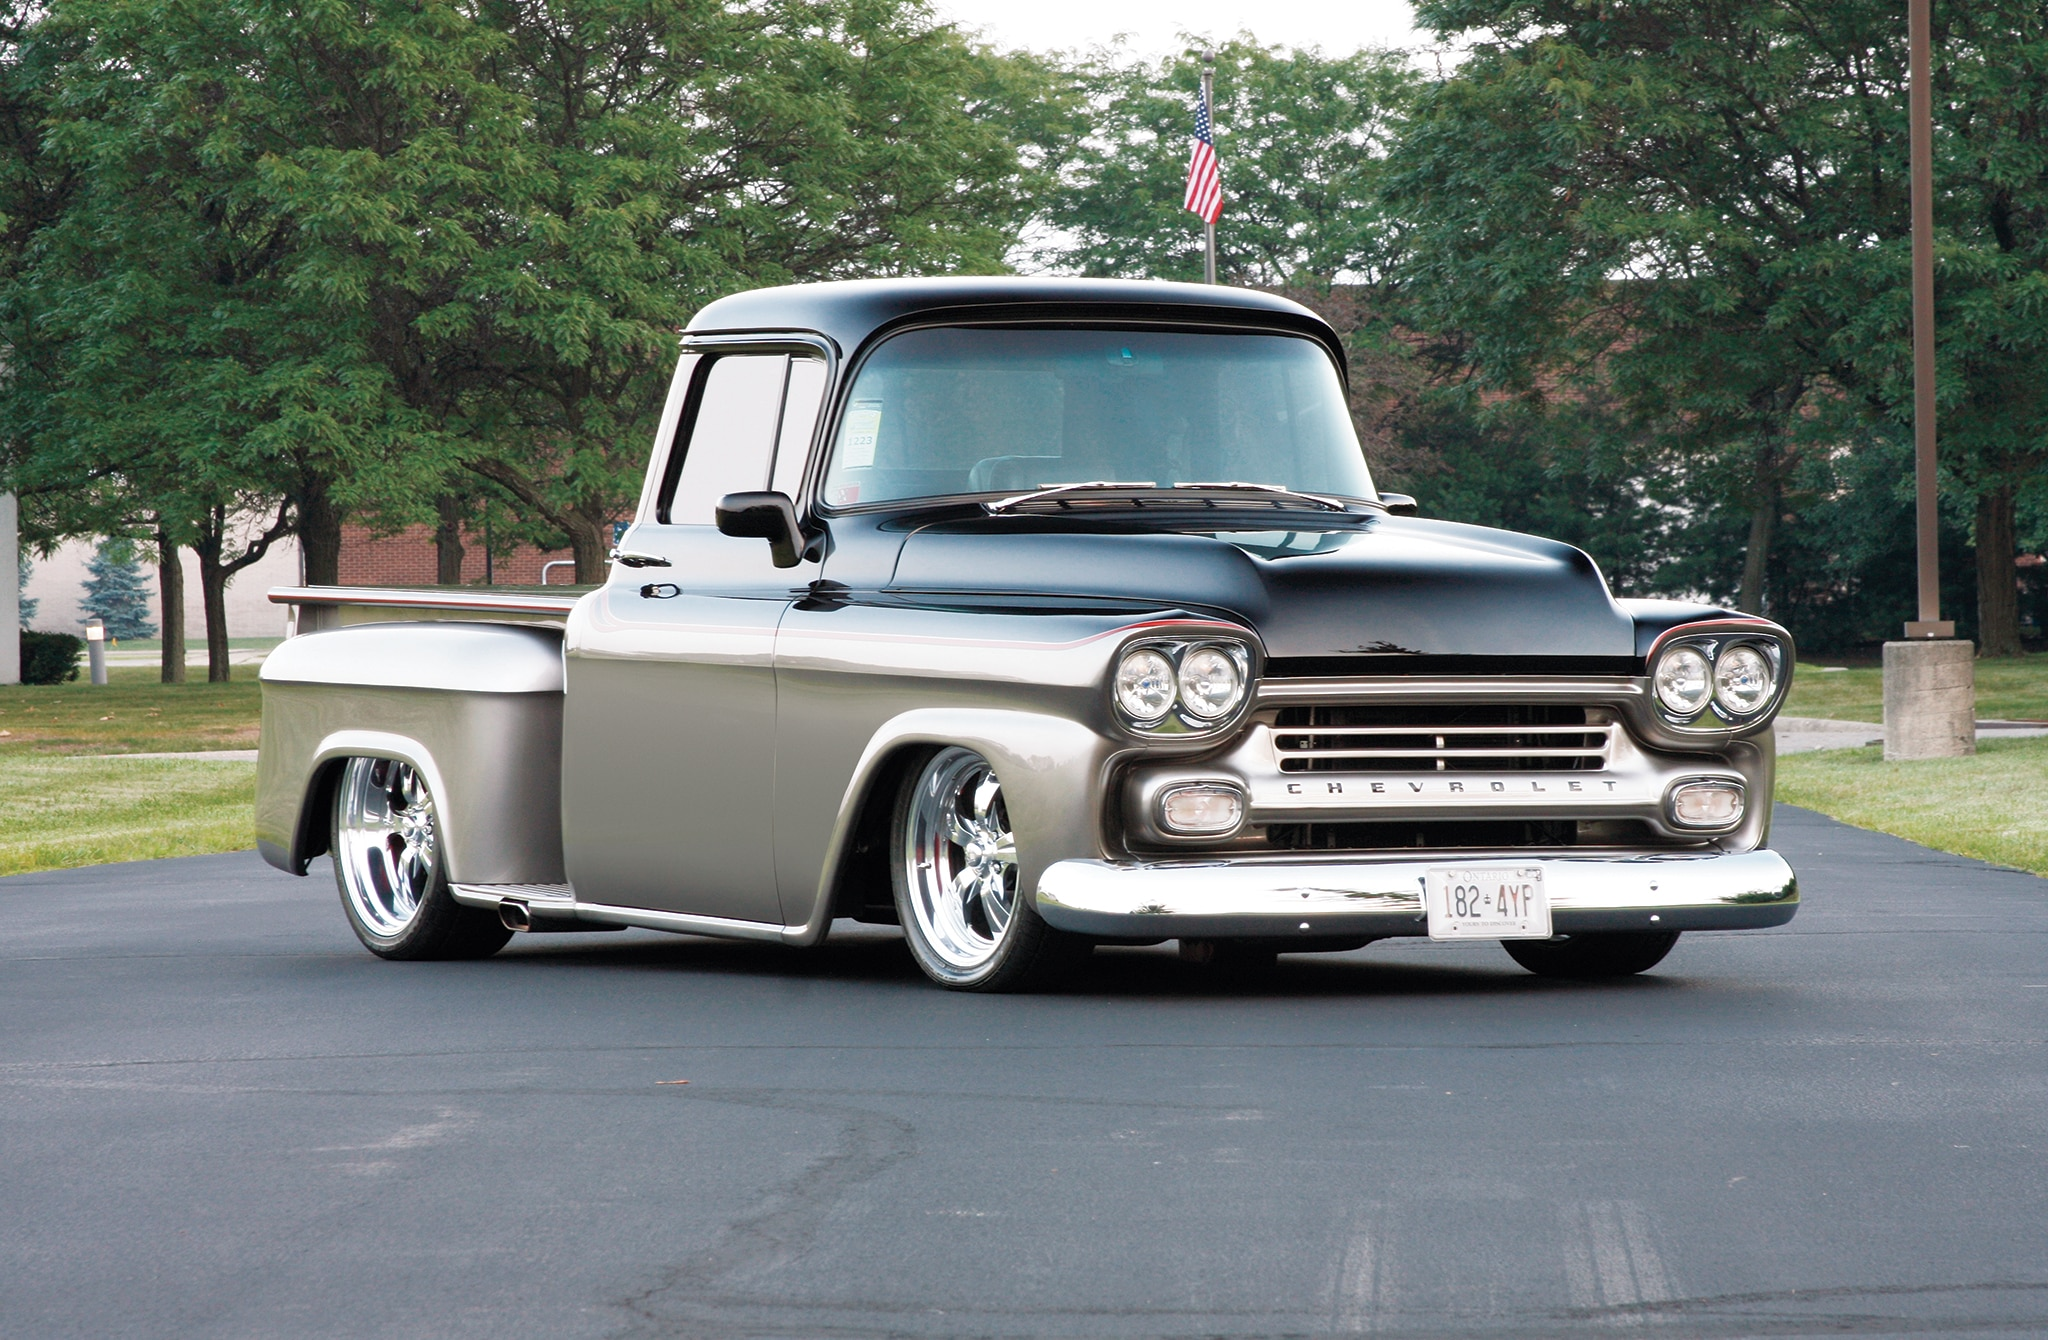 1959 Chevy Apache 3100 Truck